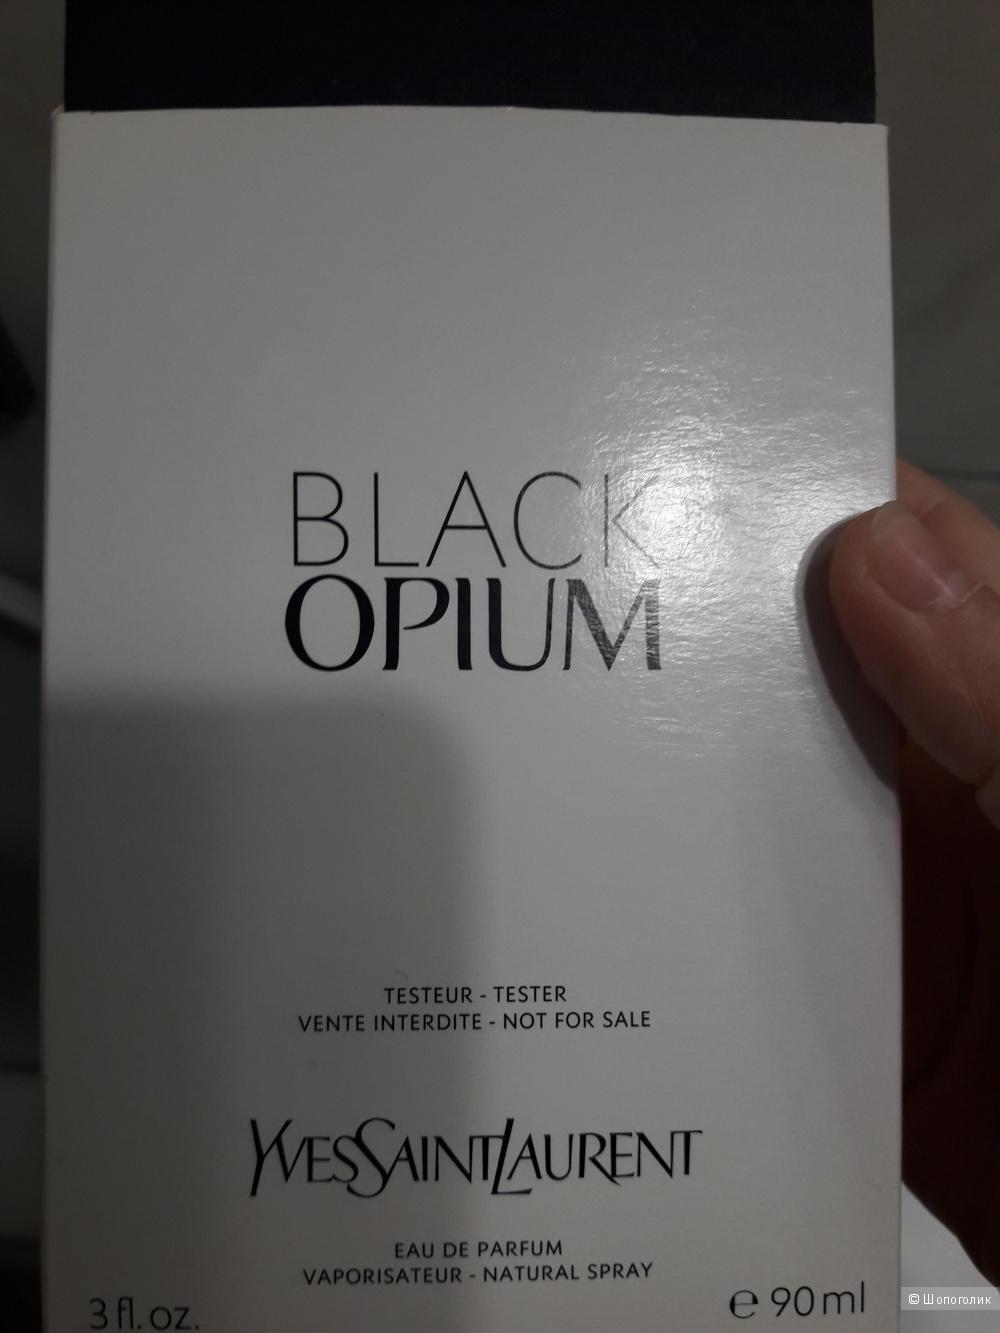 Духи,Black Opium,YSL,90 ml.